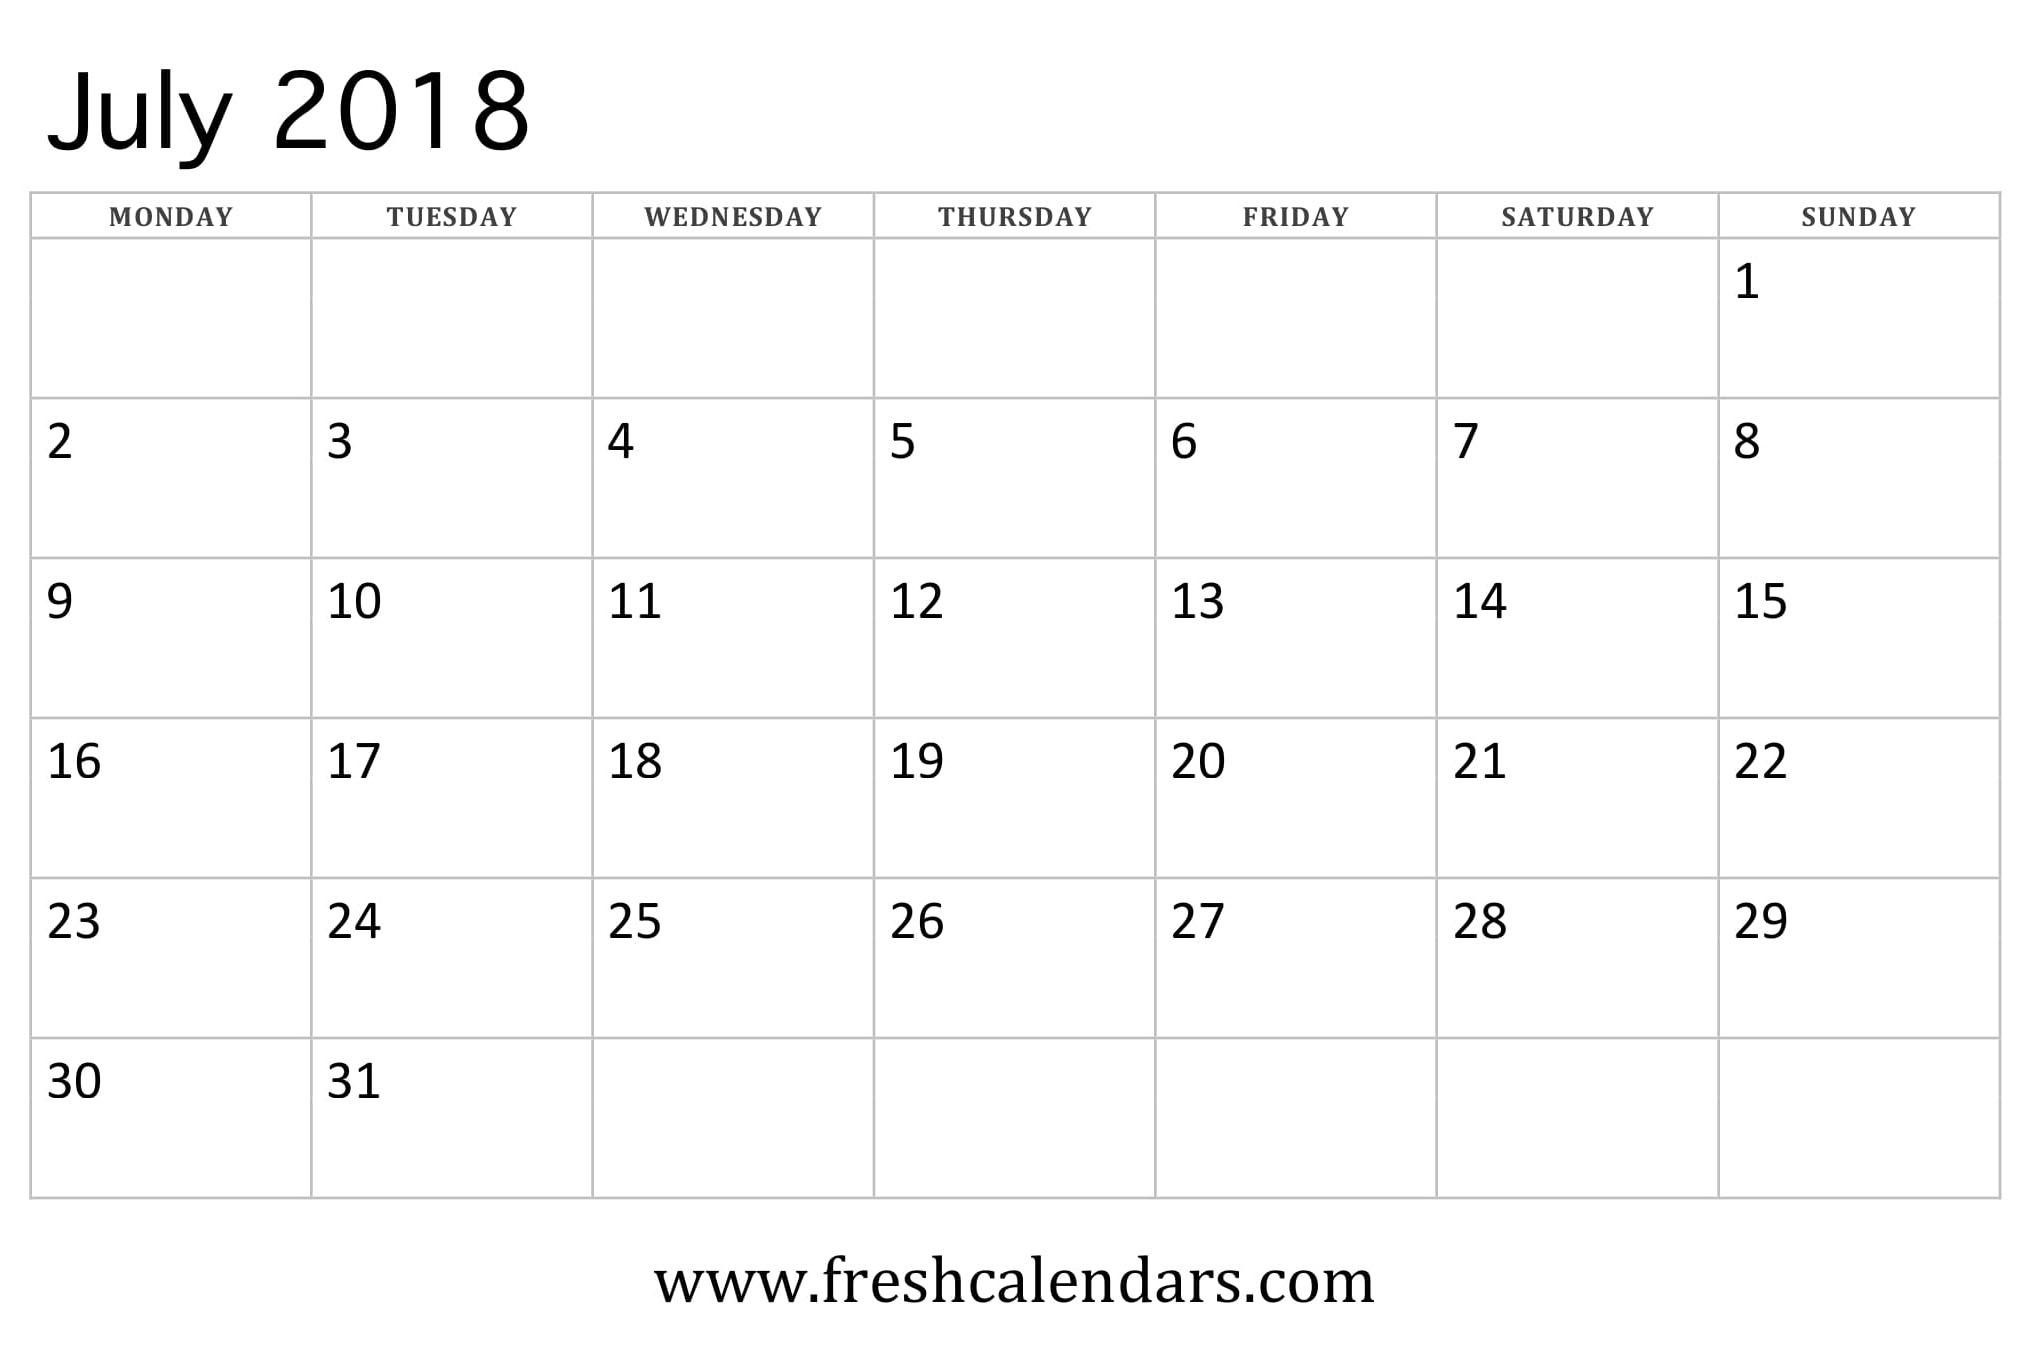 July 2018 Calendar Printable - Fresh Calendars intended for Month Calendar Beginning On Monday